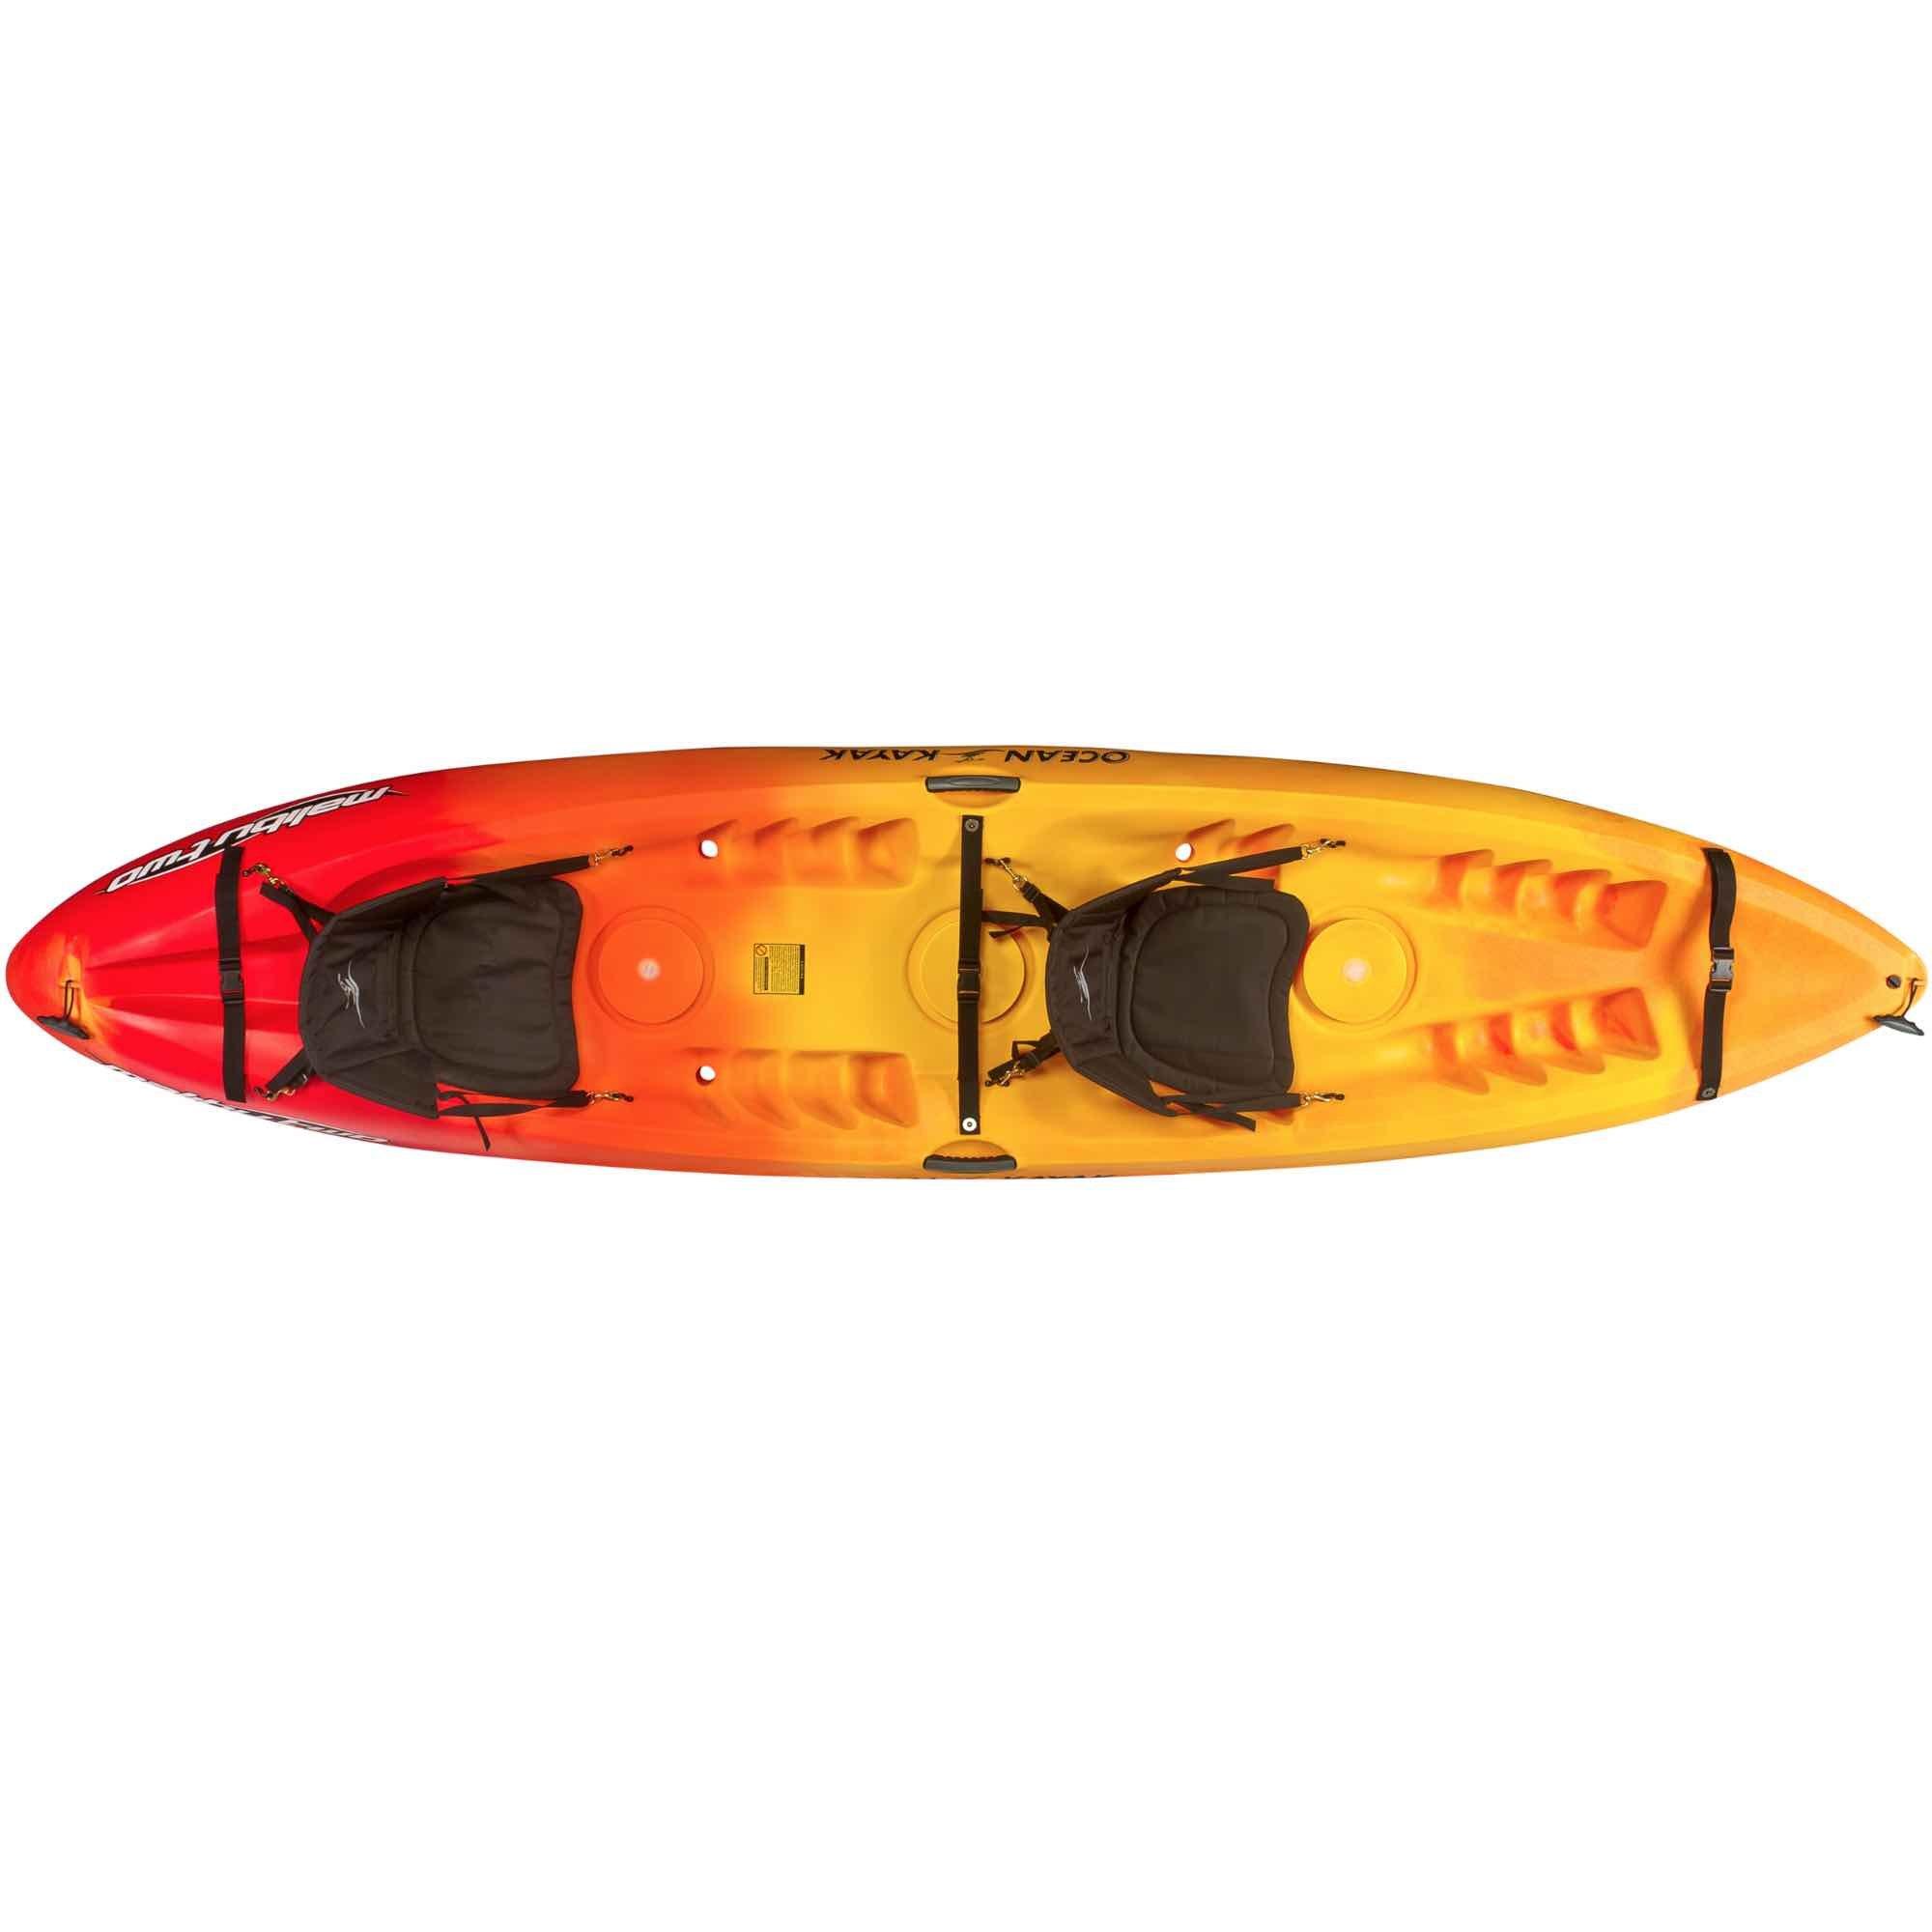 Ocean Kayak Malibu Two Malibu 2 double tandem Sunrise